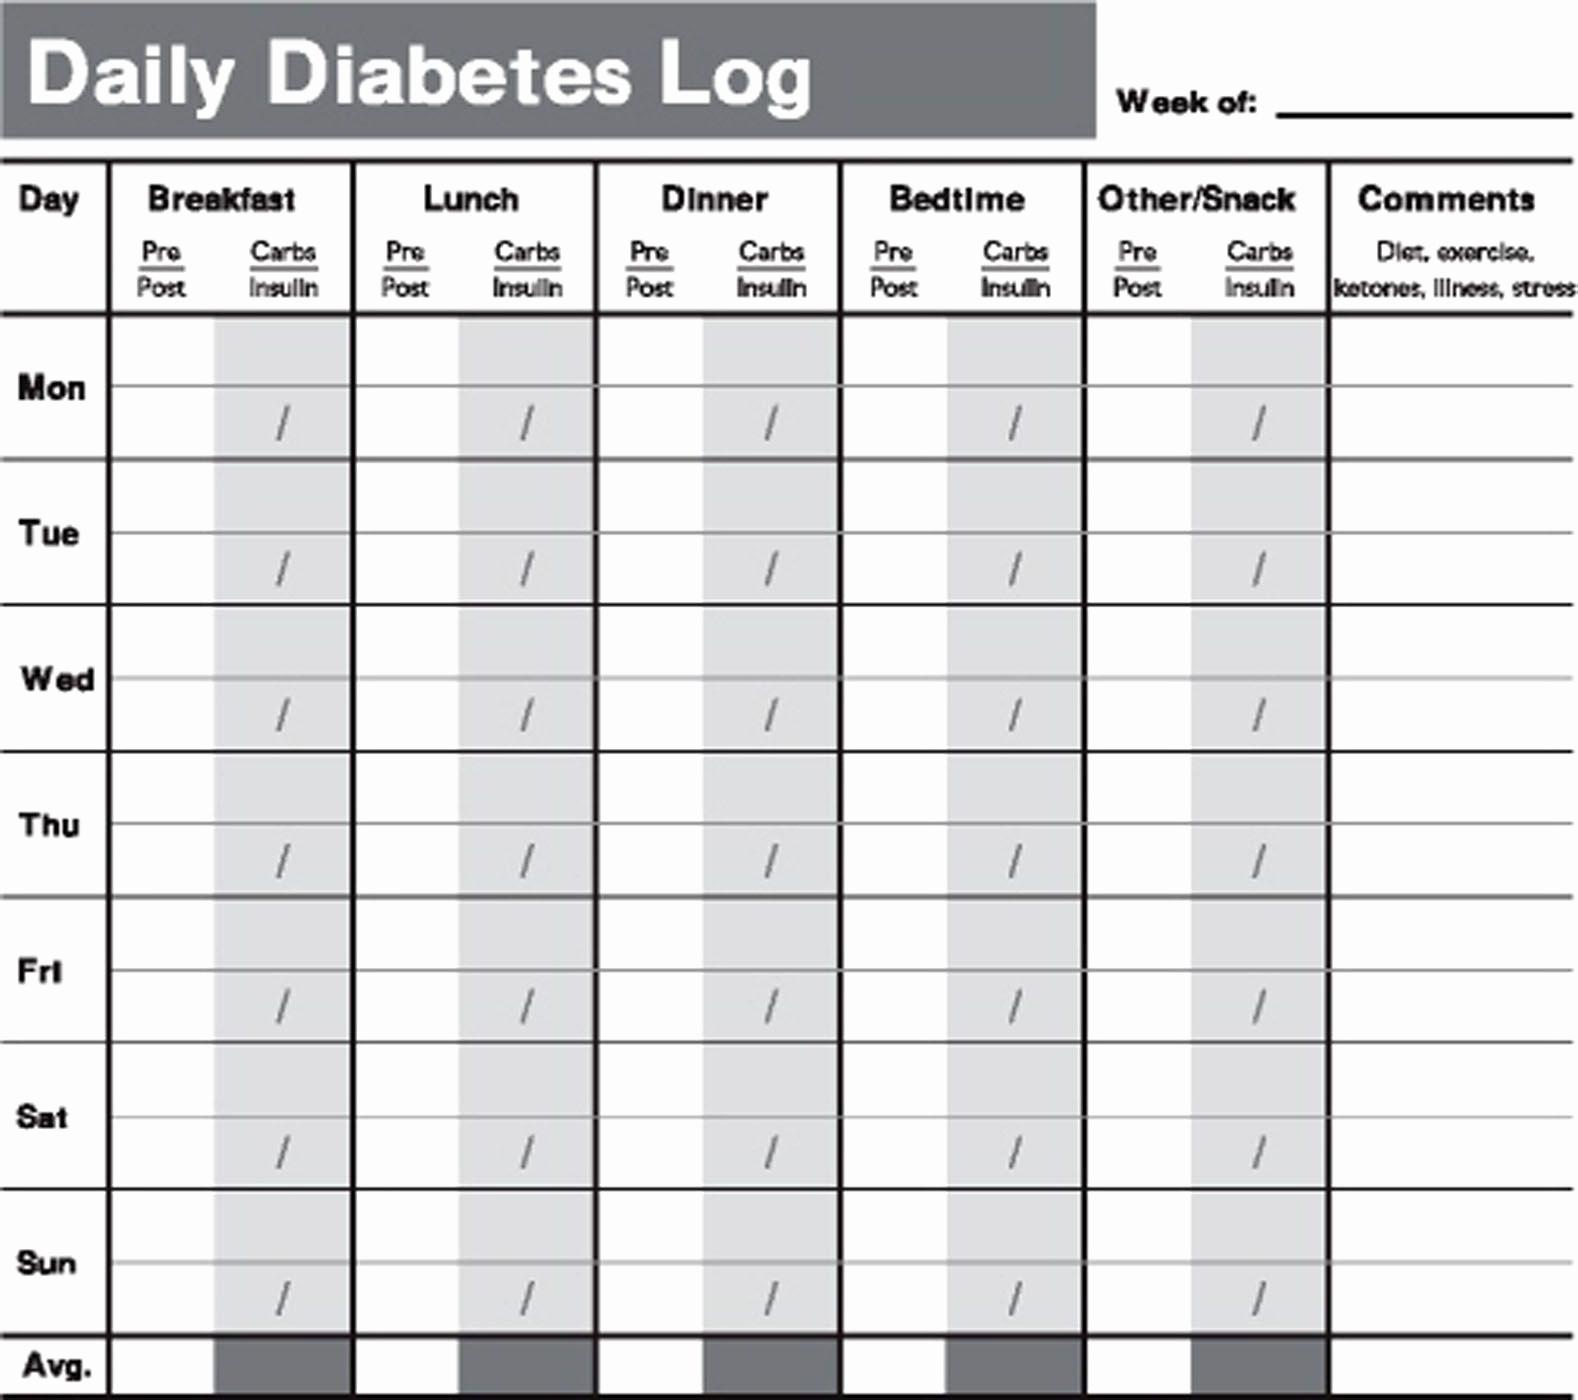 5X5 Workout Routine Spreadsheet Pertaining To Diabetes Tracker Spreadsheet As Wedding Budgetts 5X5 Sheet  Askoverflow